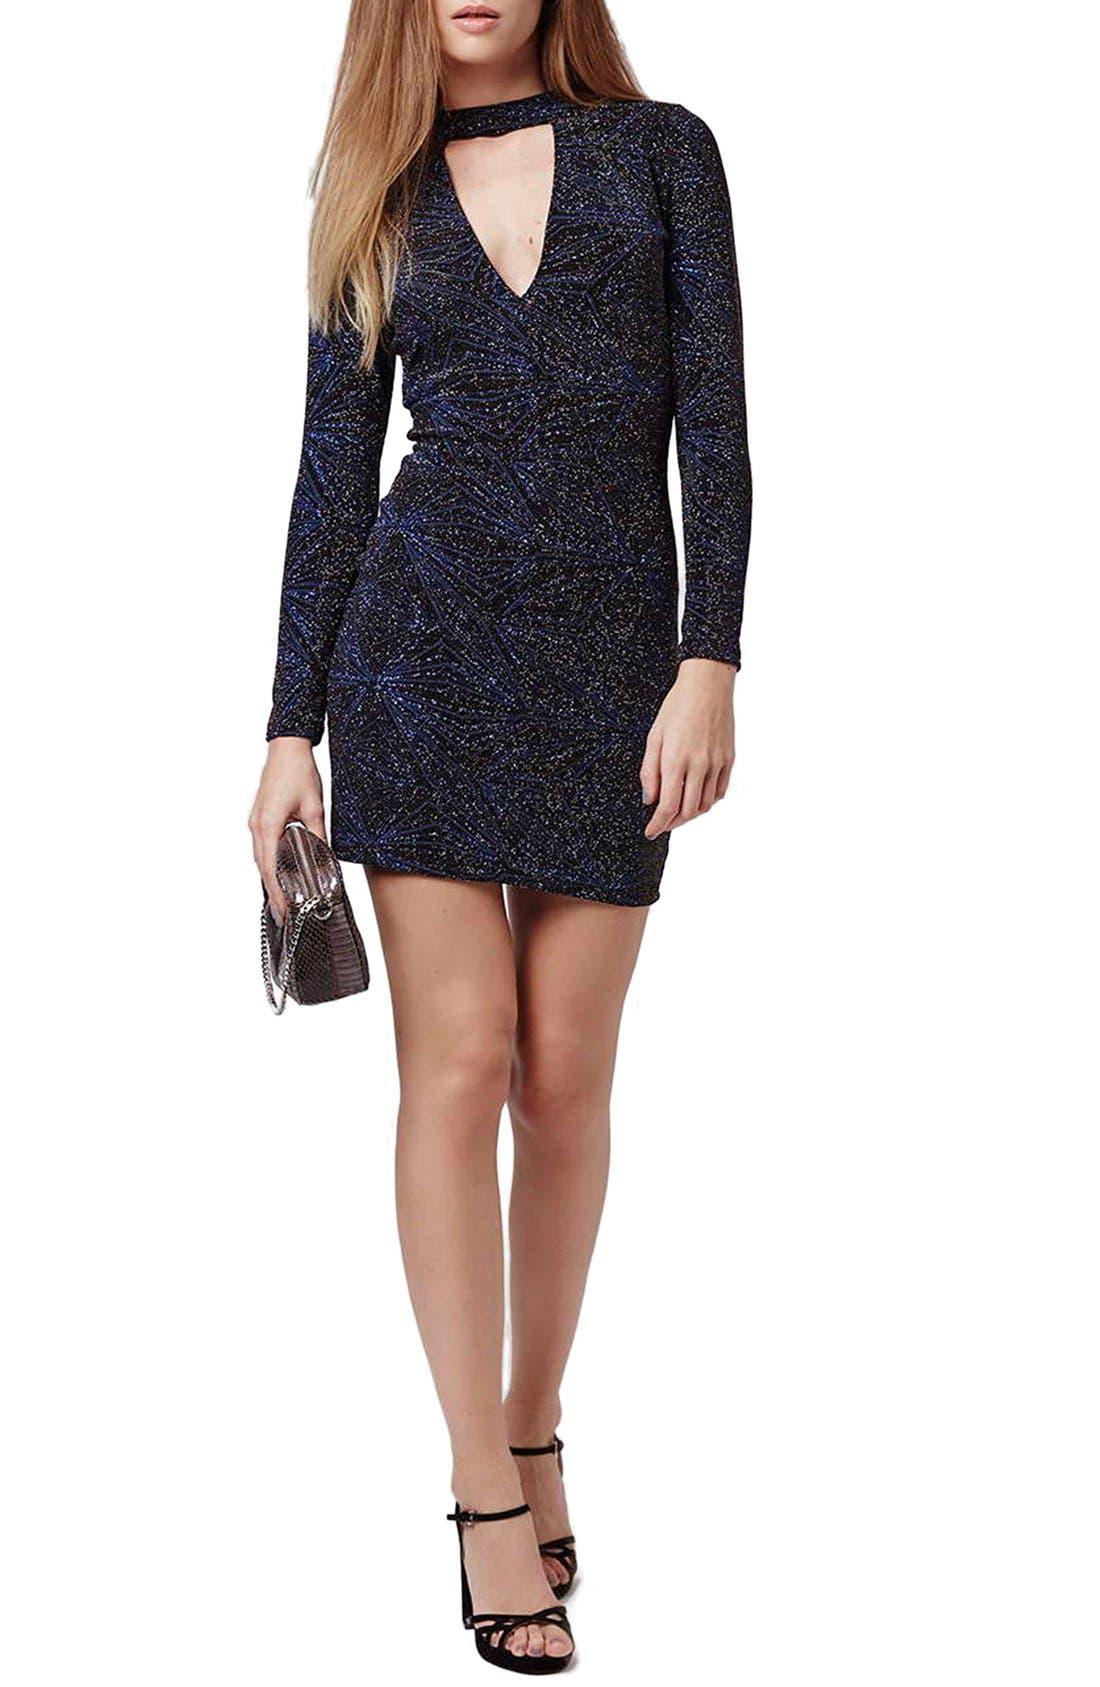 Alternate Image 1 Selected - Topshop Metallic Long Sleeve Body-Con Dress